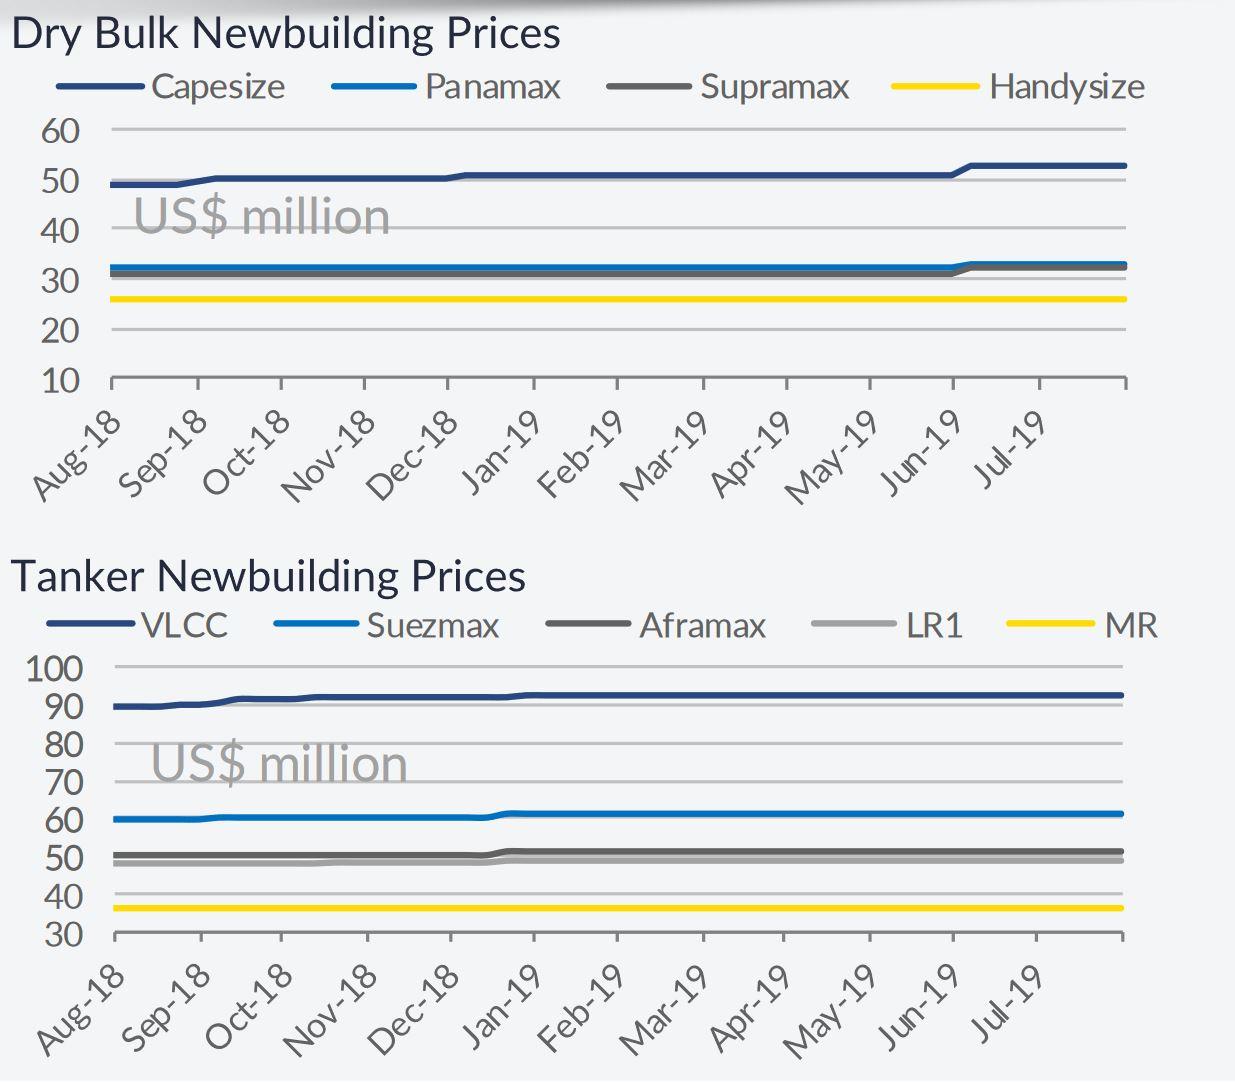 Newbuilding Market Showing Signs of Renewed Demand